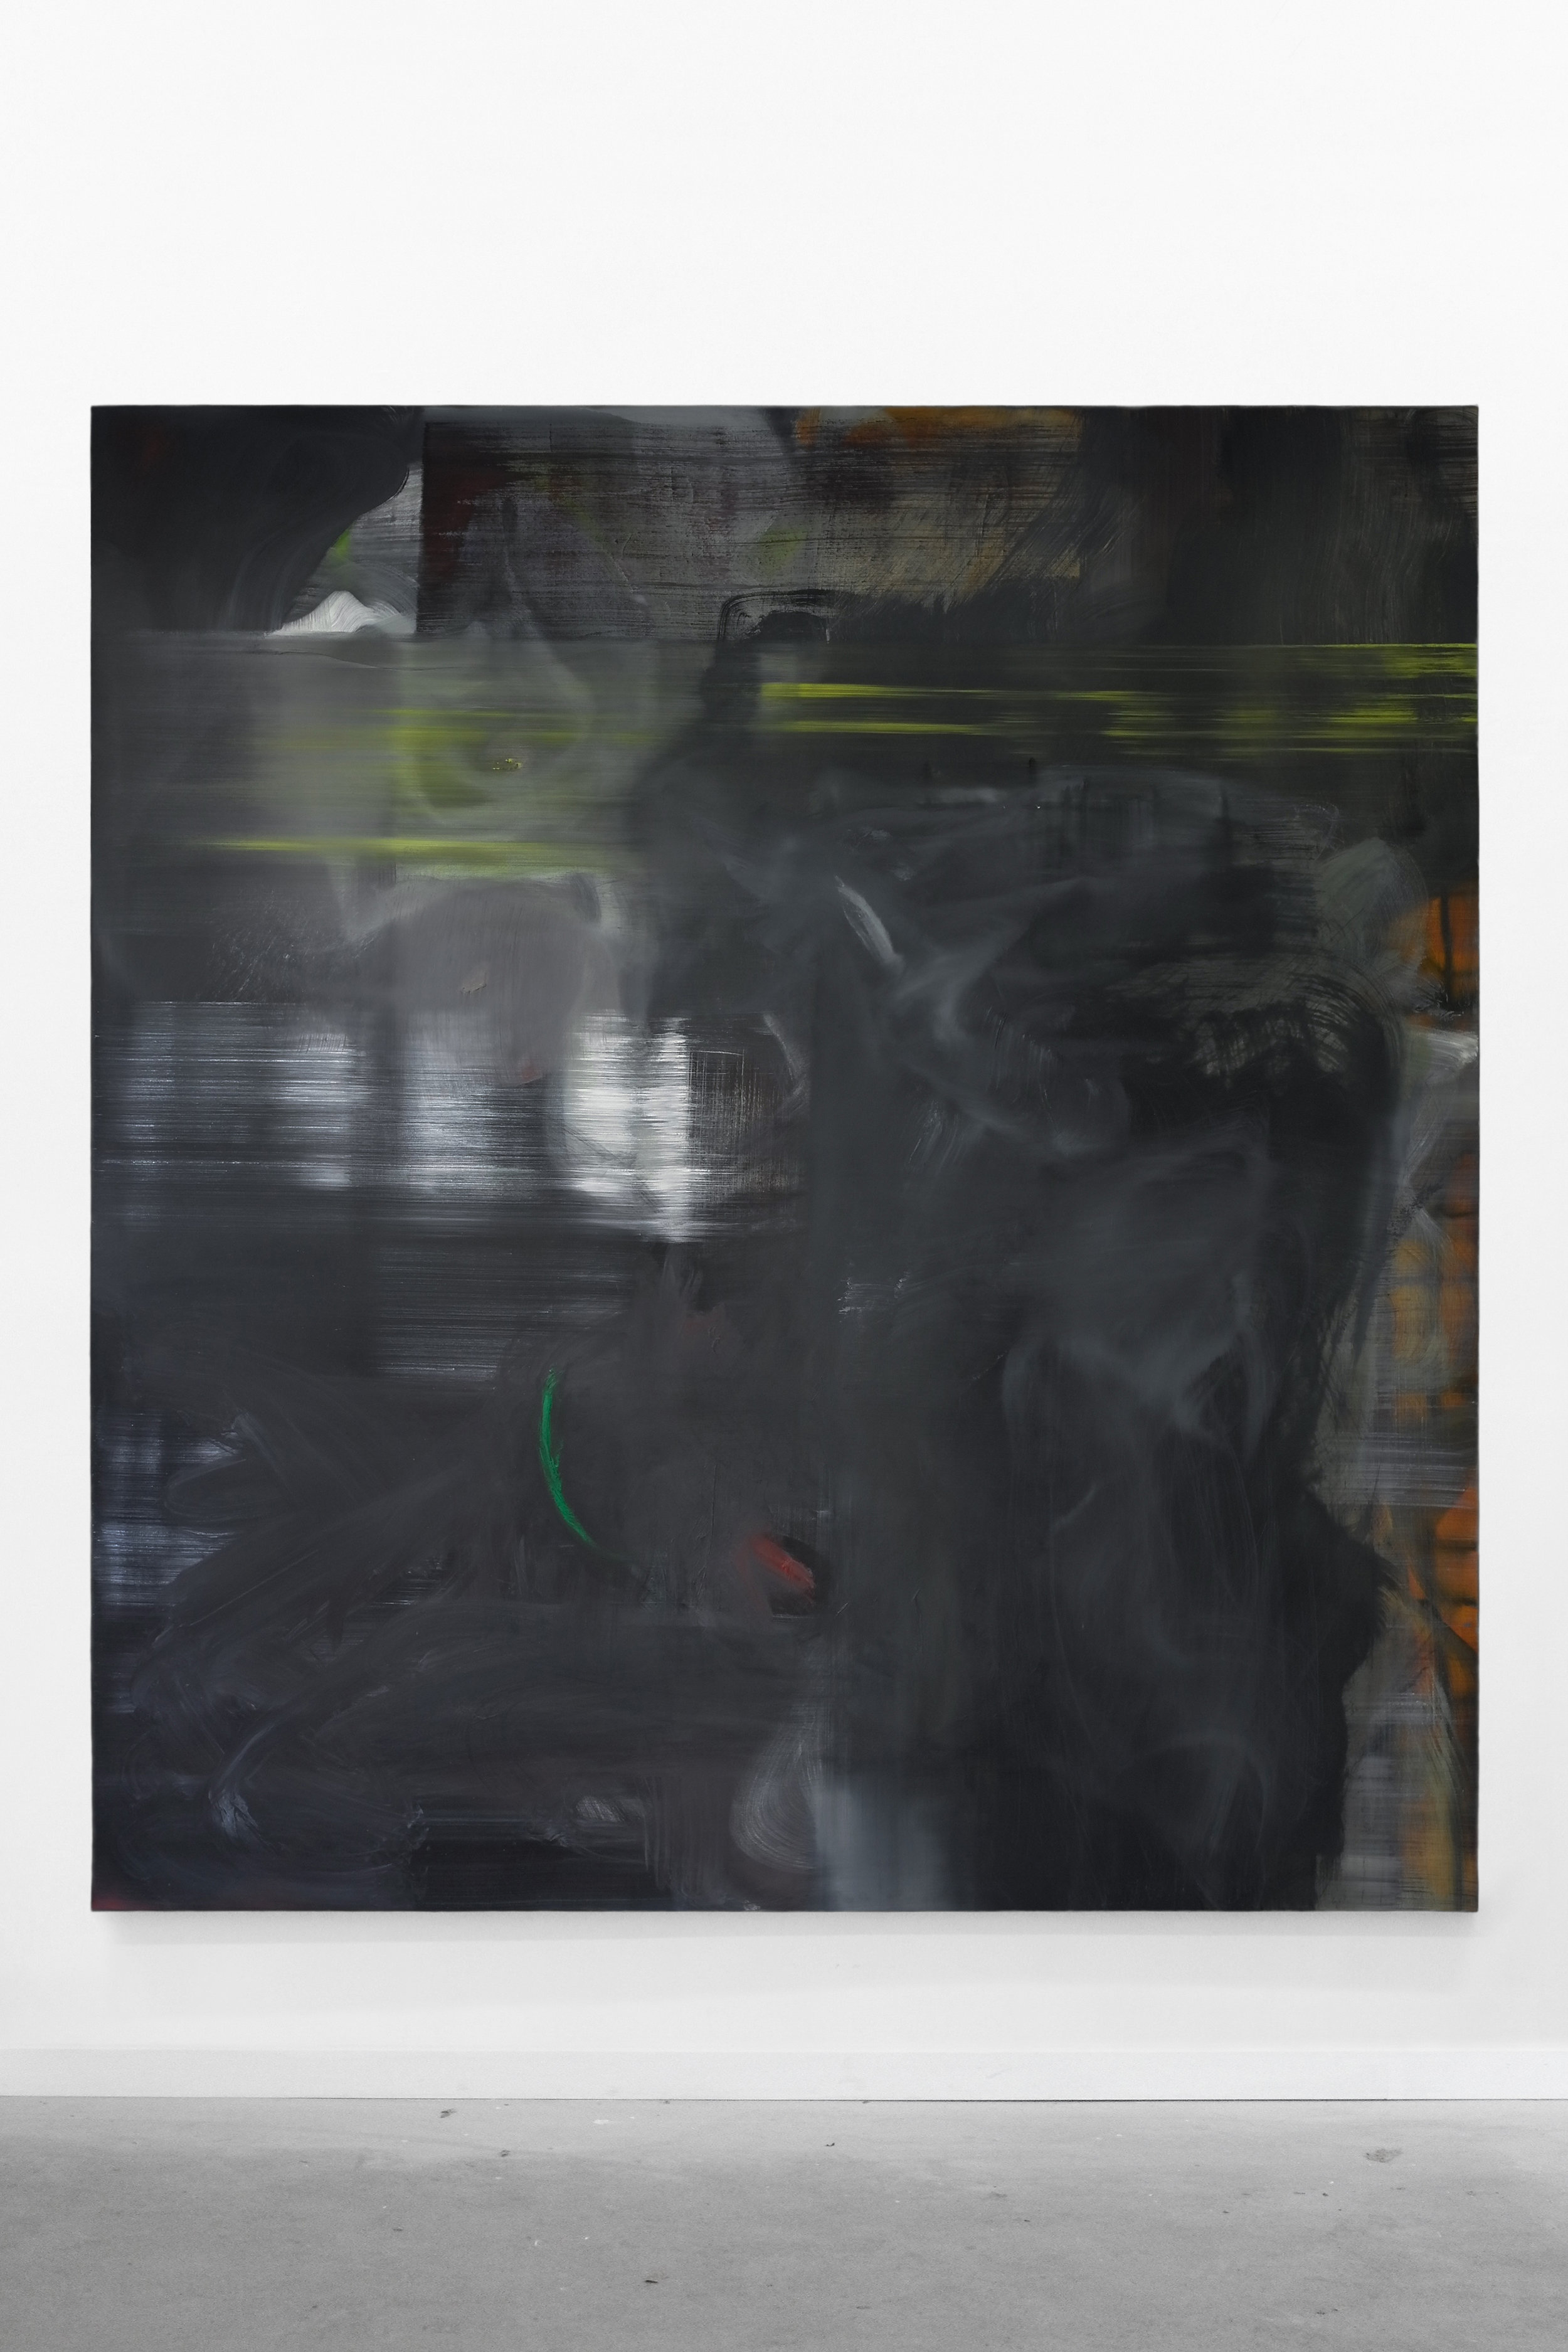 S. Derviz, Dancers II, oil on canvas, 220 x 200cm, 2018